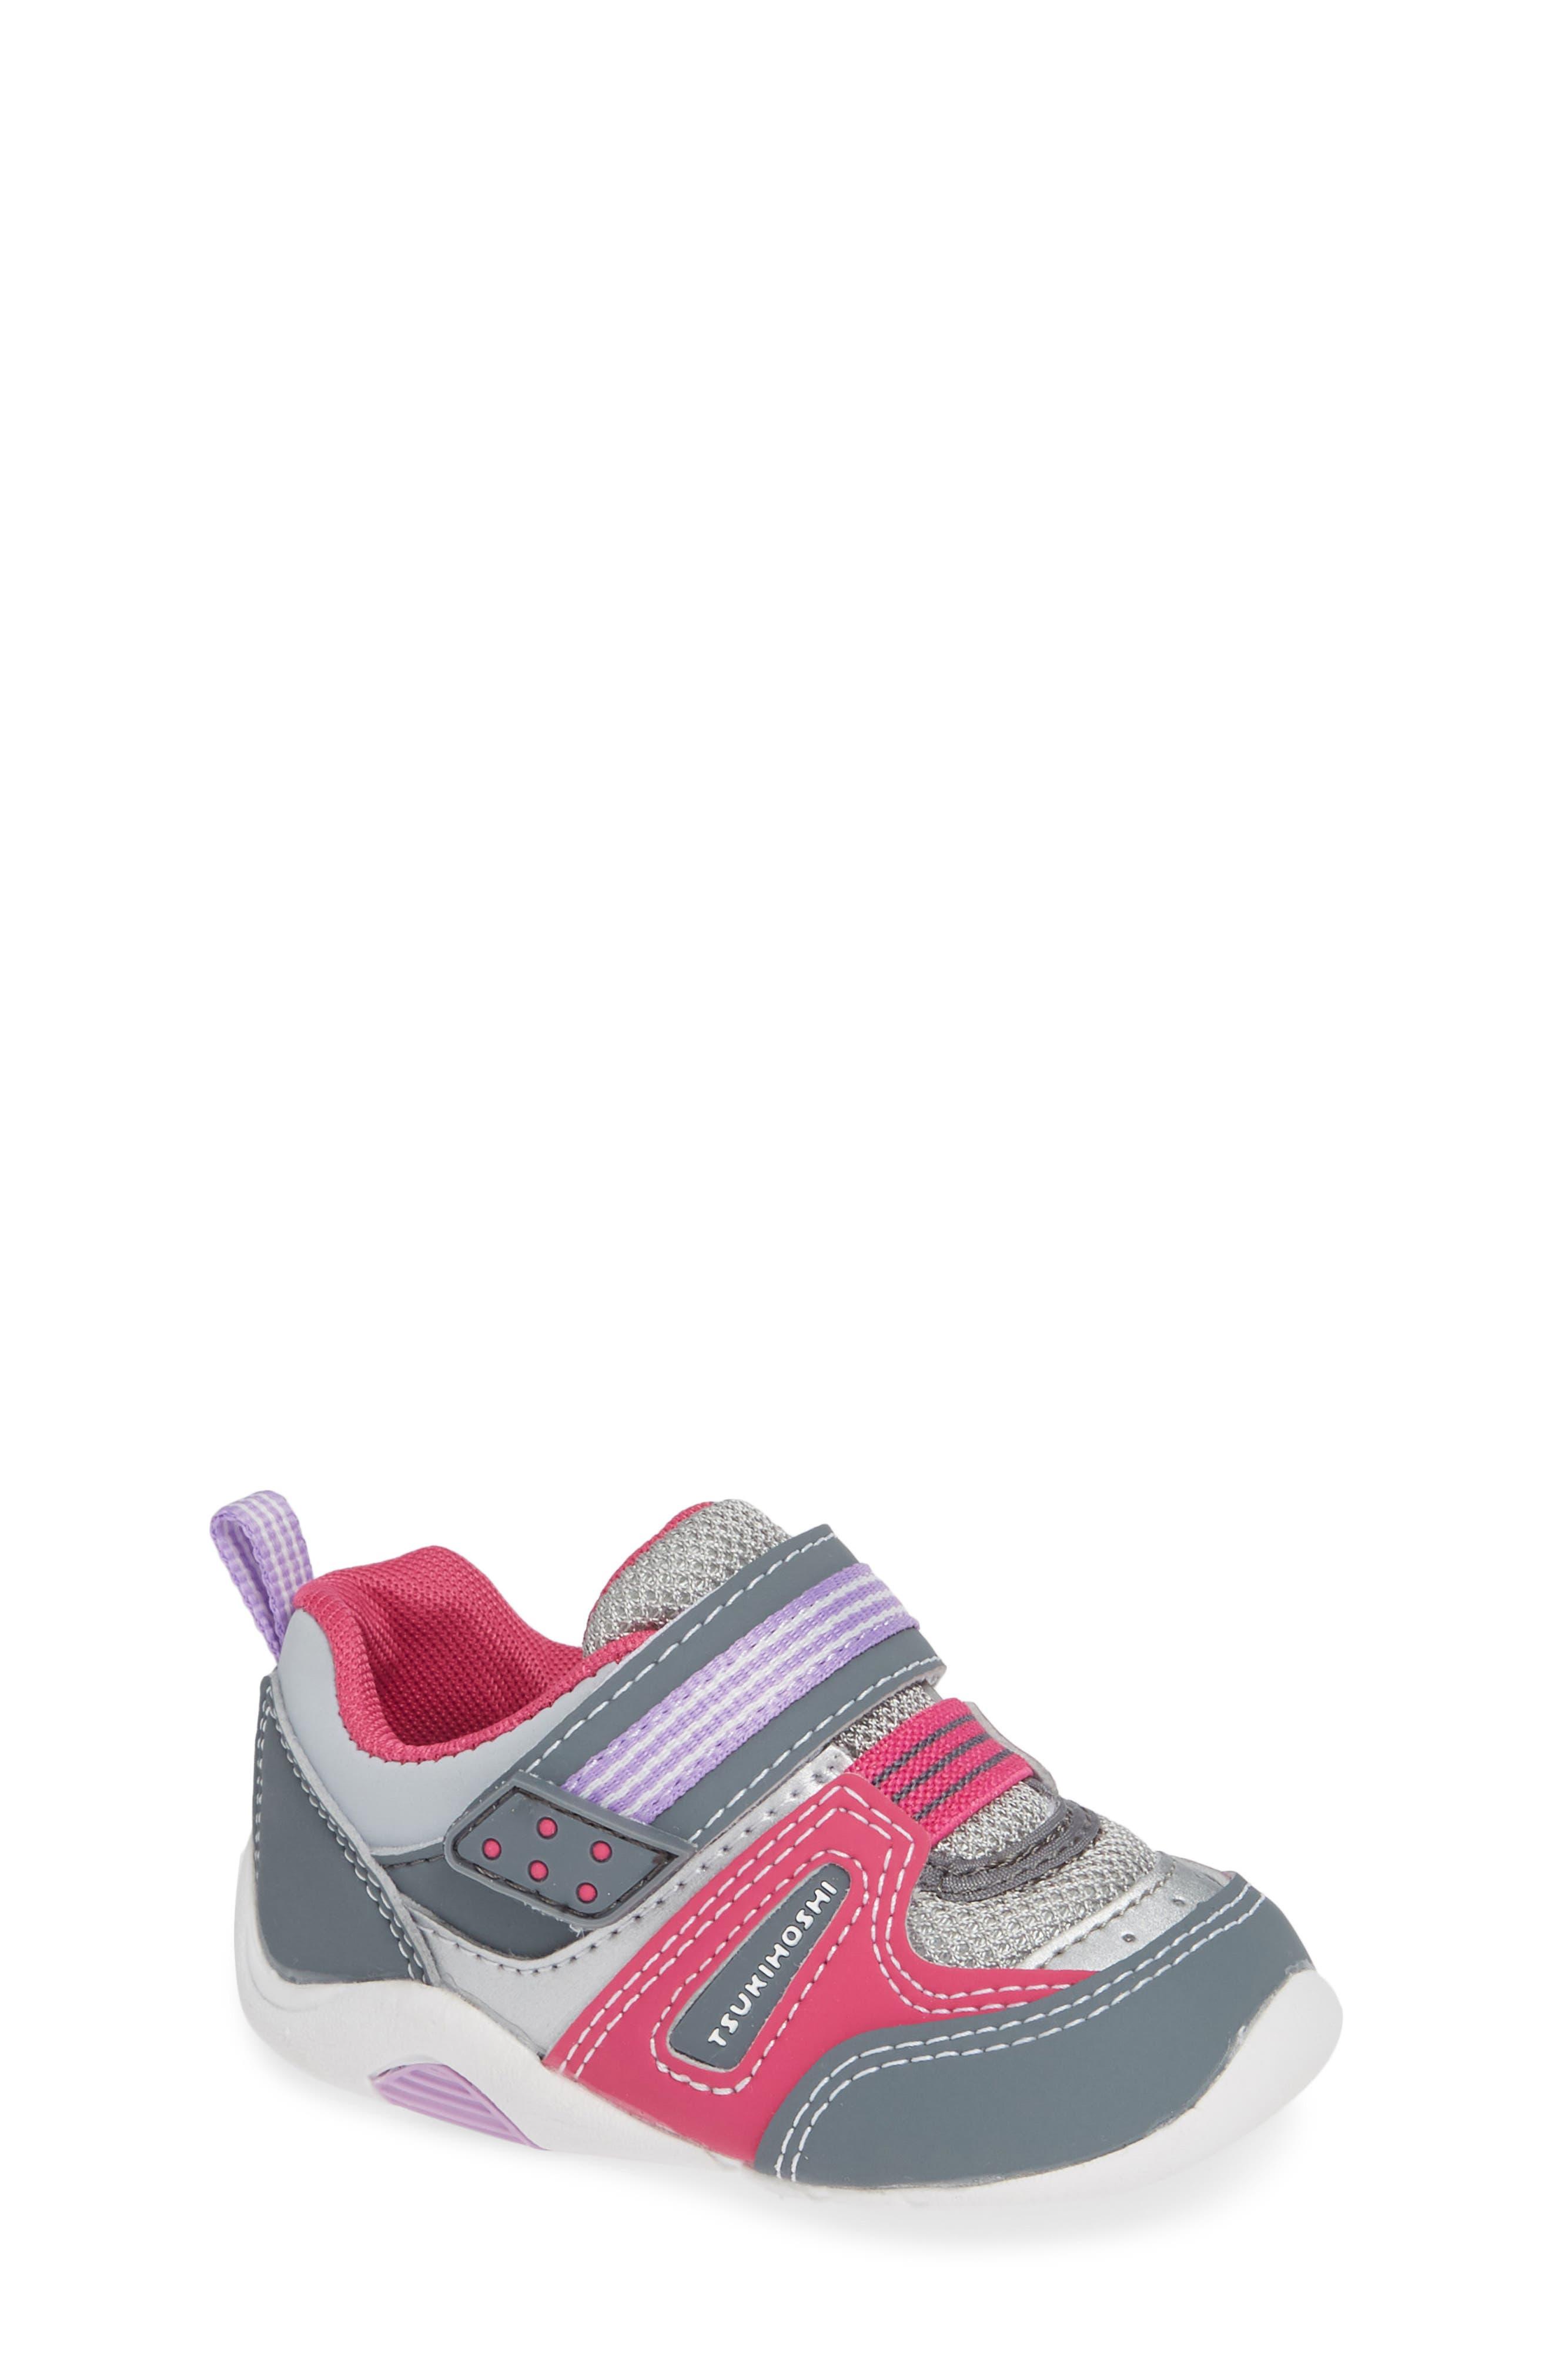 Infant Girls Tsukihoshi Neko Washable Sneaker Size 4 M  Grey